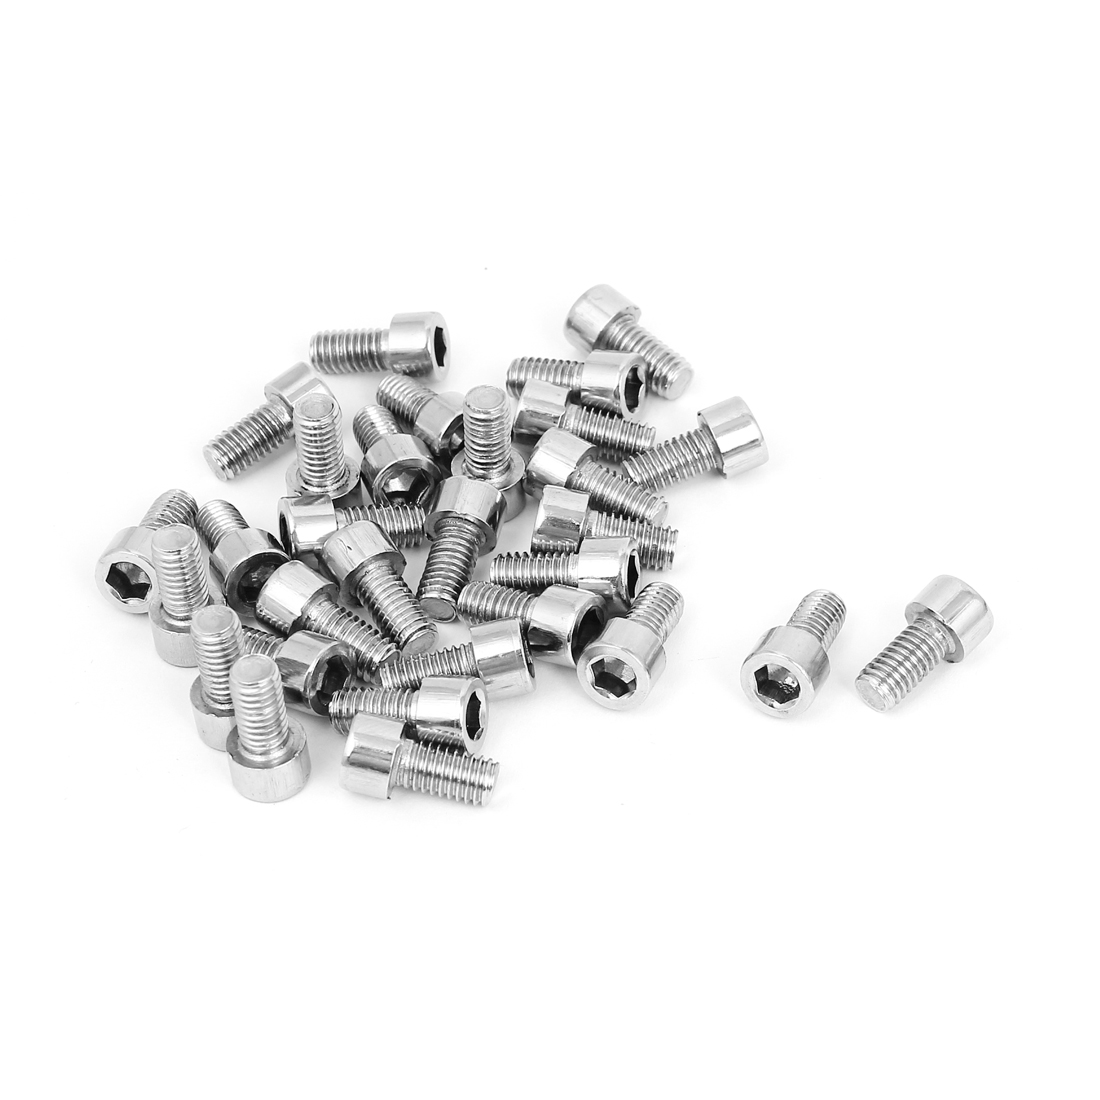 30 Pcs 17mm Long 6mmx12mm Stainless Steel Hex Socket Head Cap Screws 1.0mm Pitch